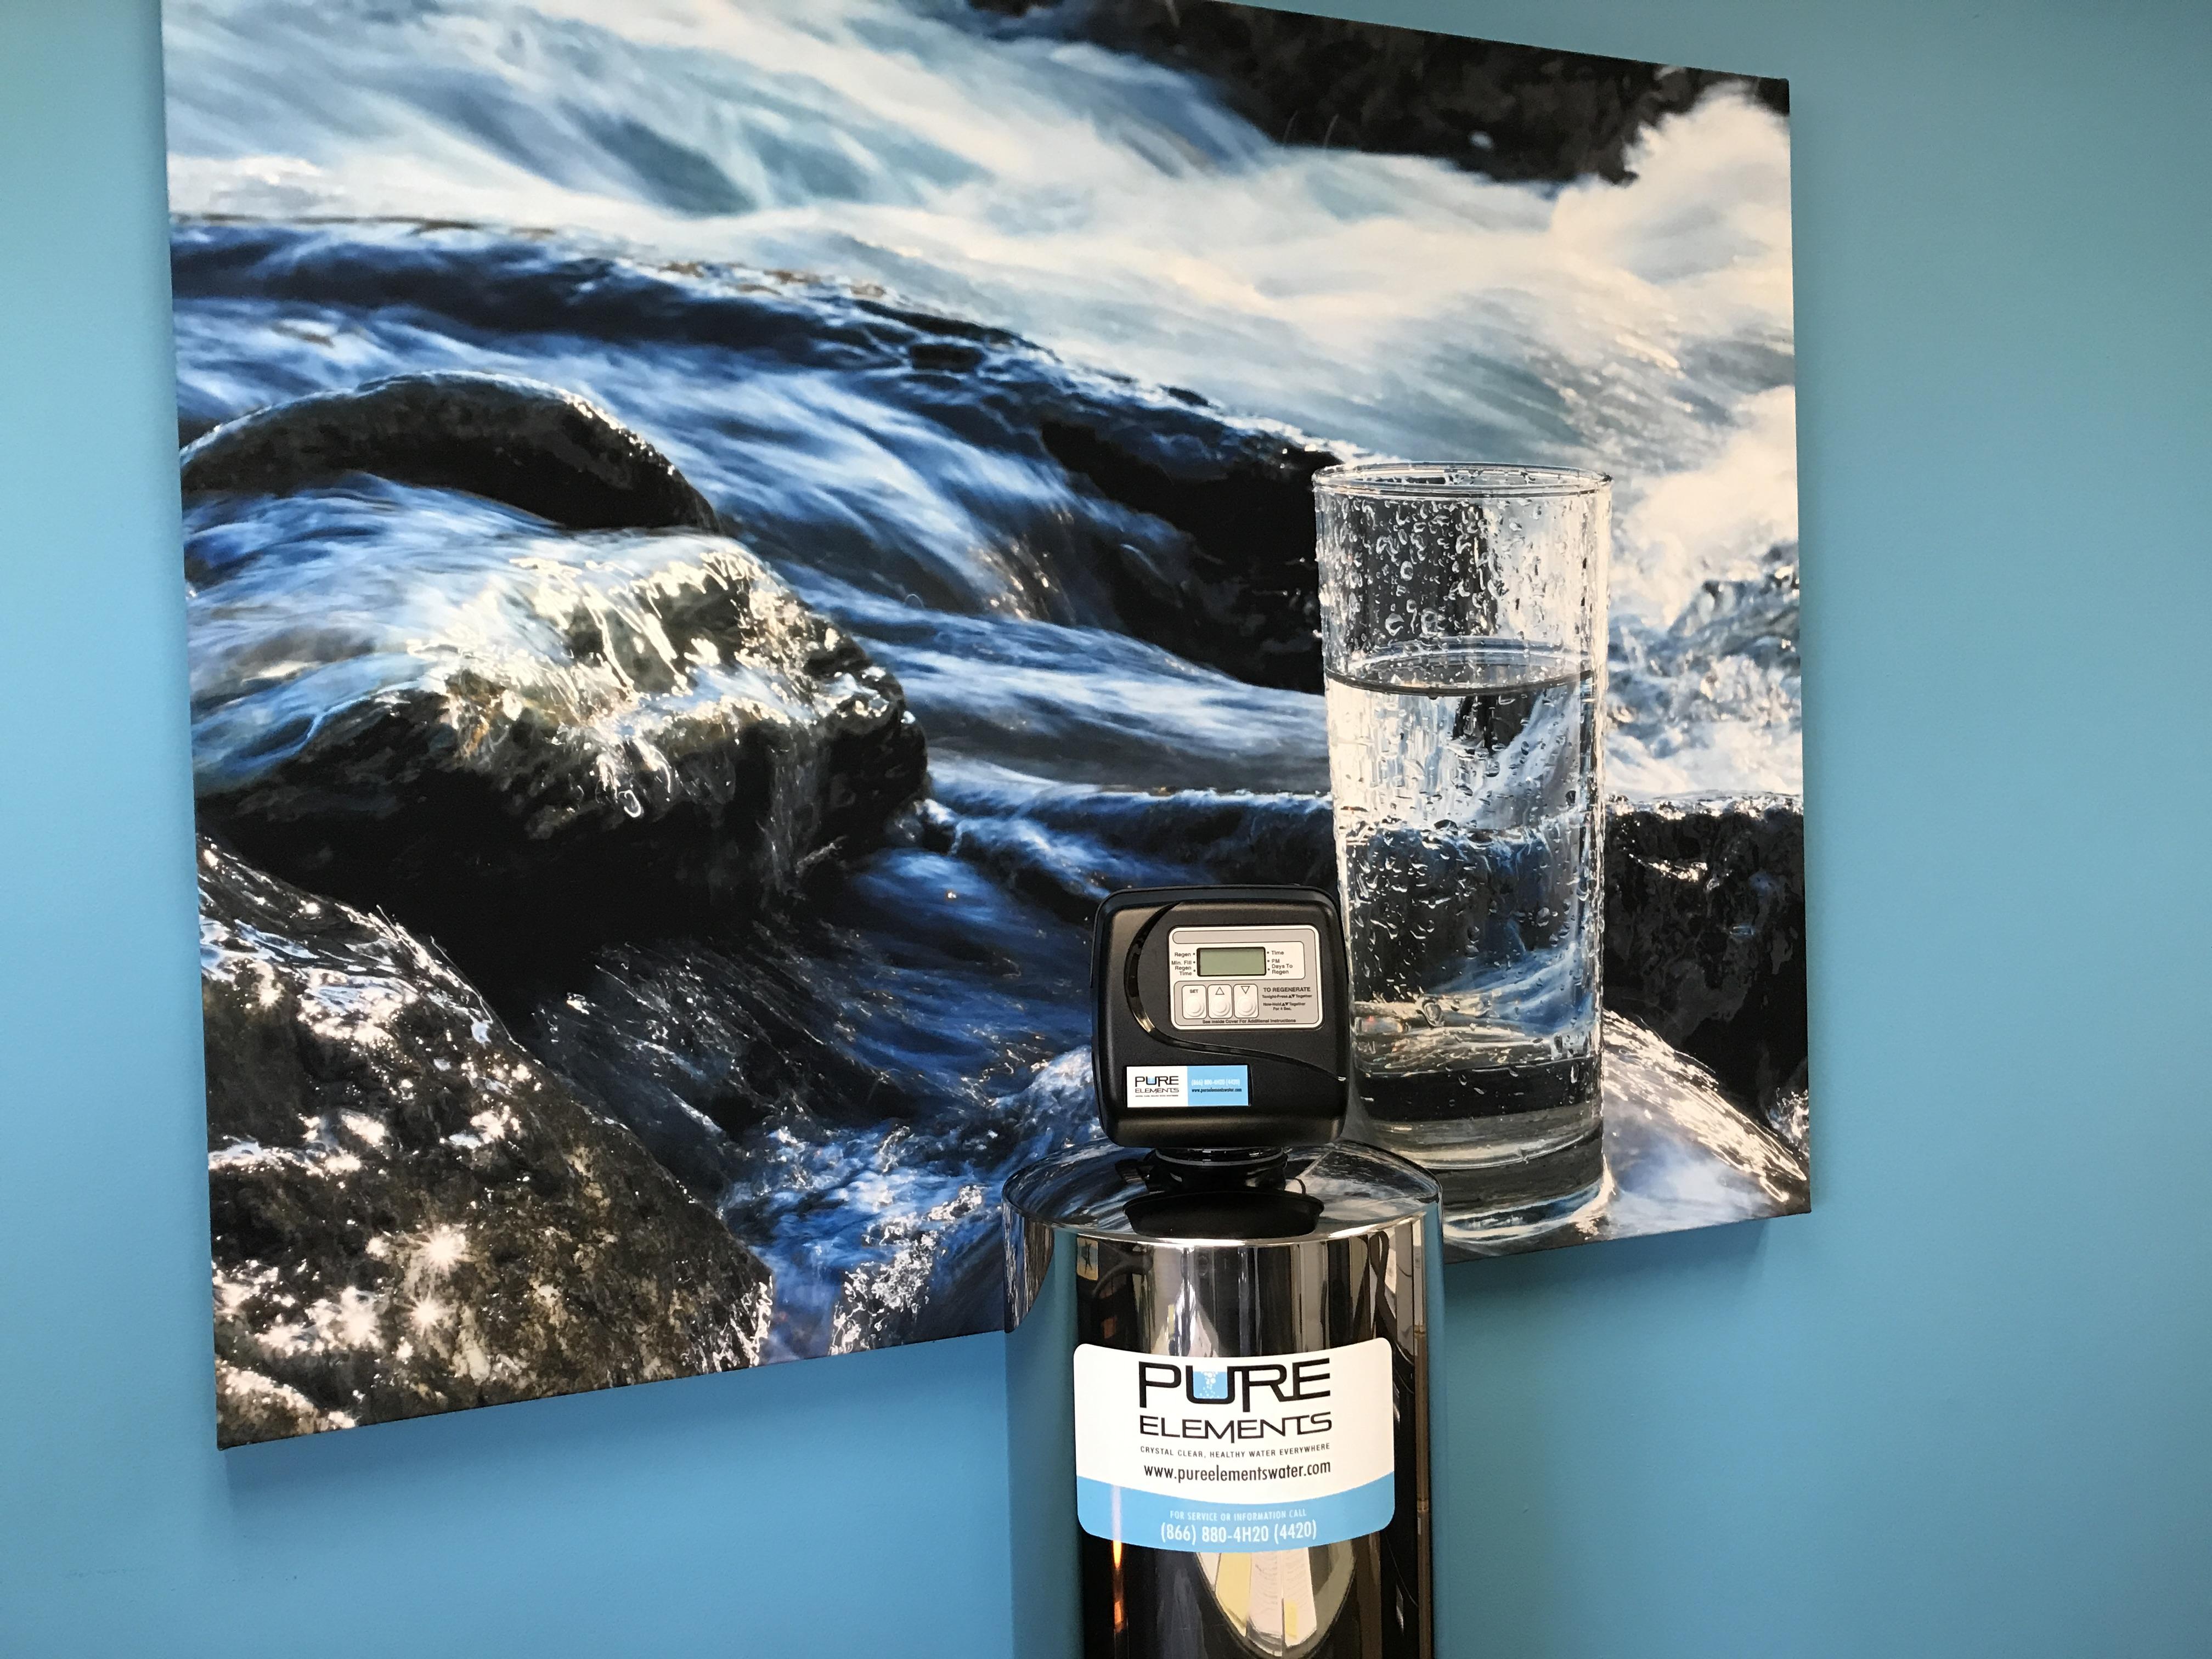 Office water filter in Newport Beach CA